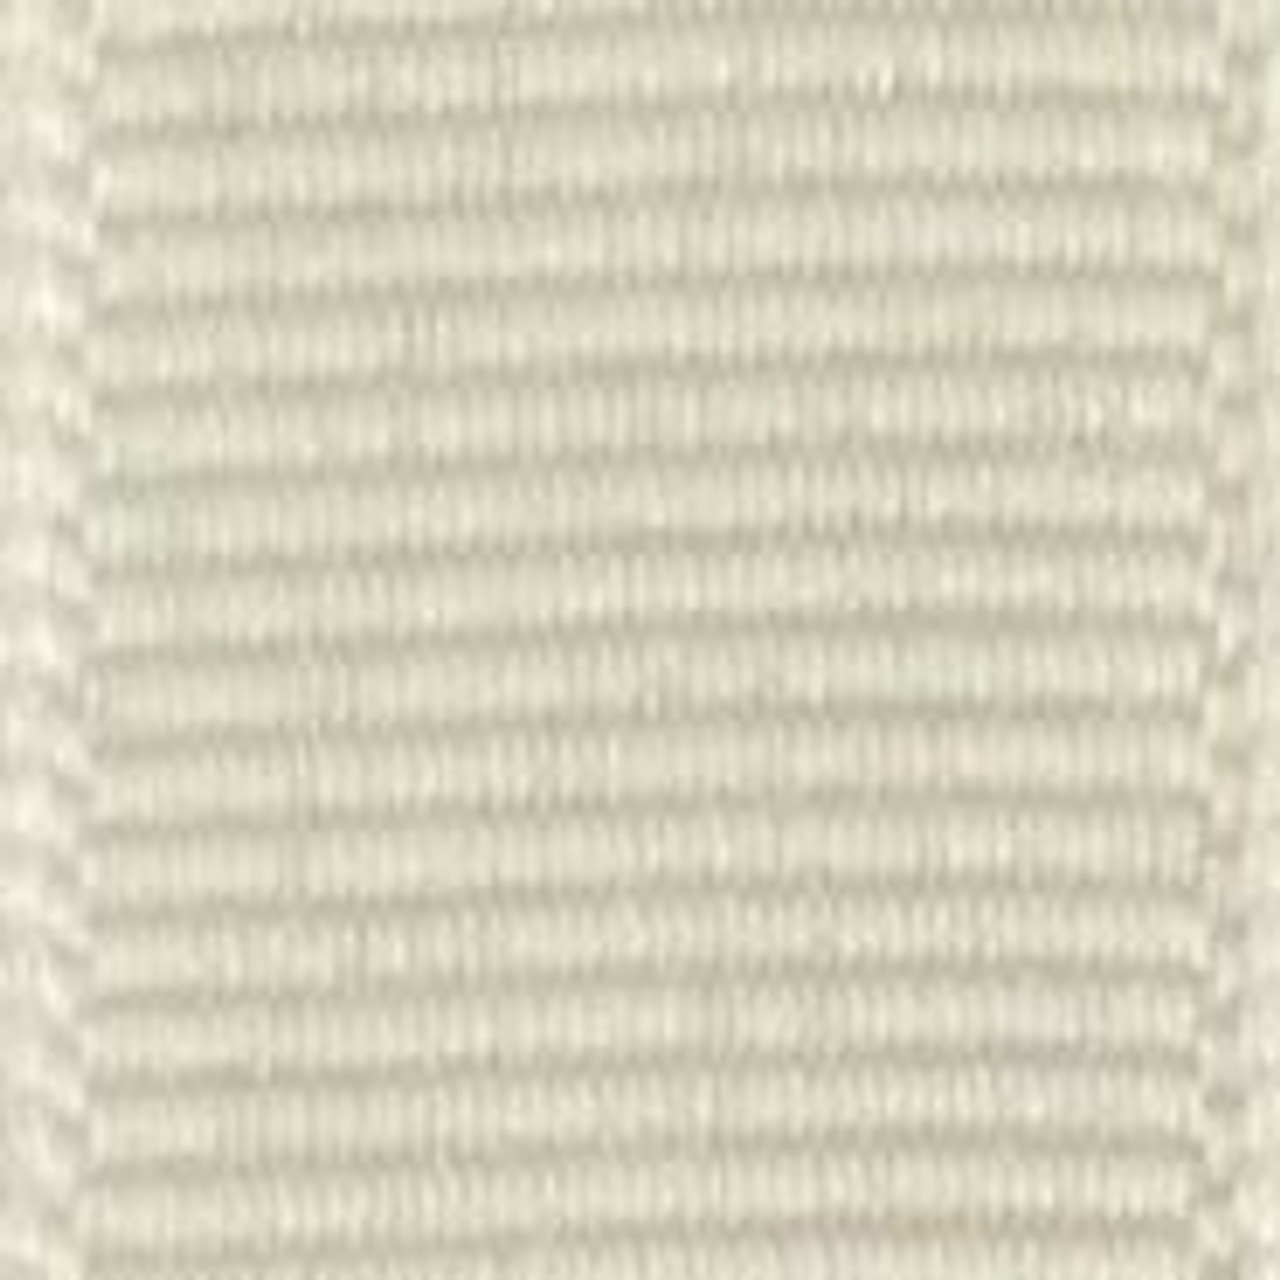 Antique White Offray Grosgrain Ribbon